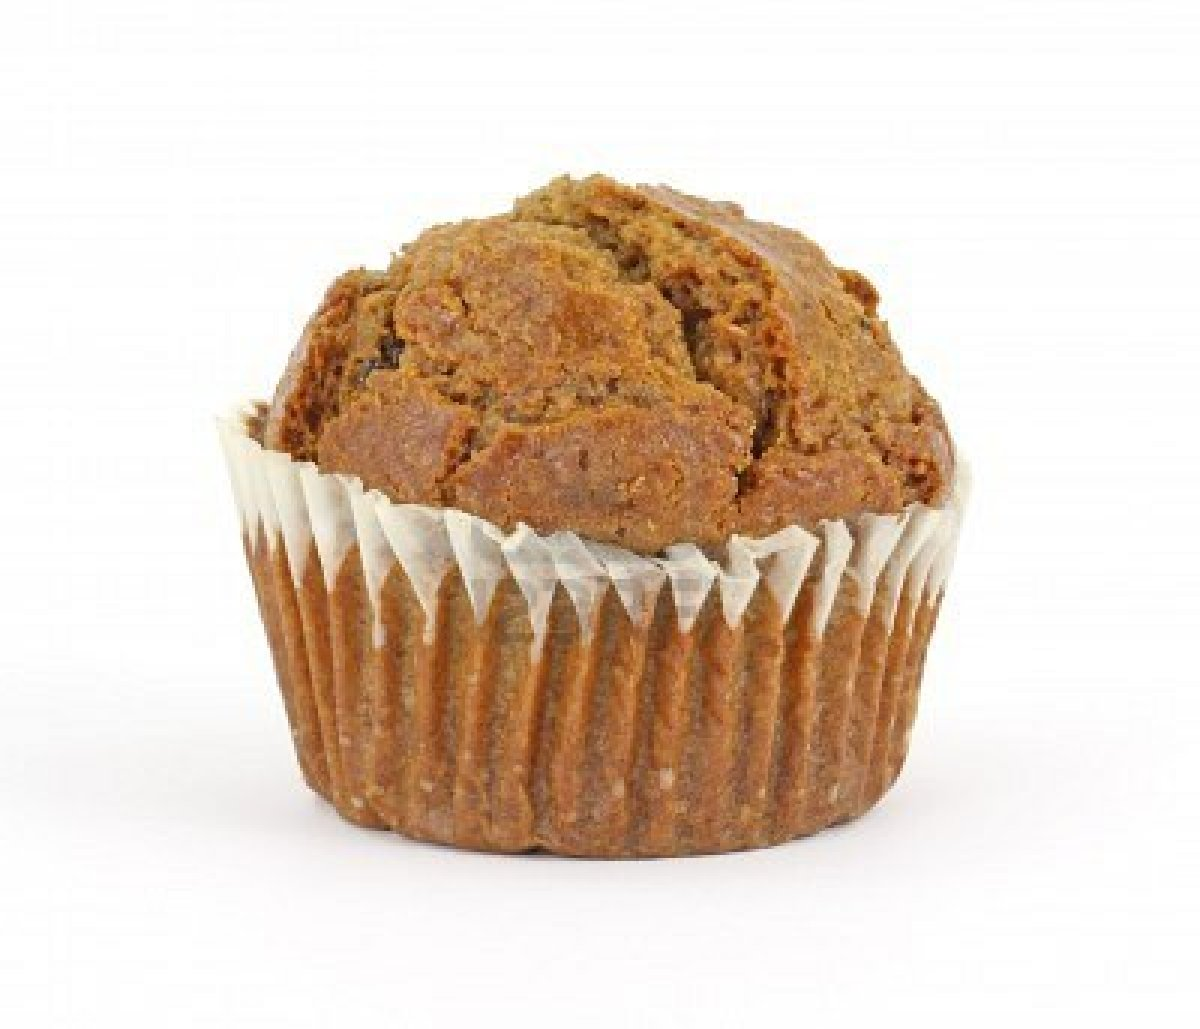 Muffin Bran